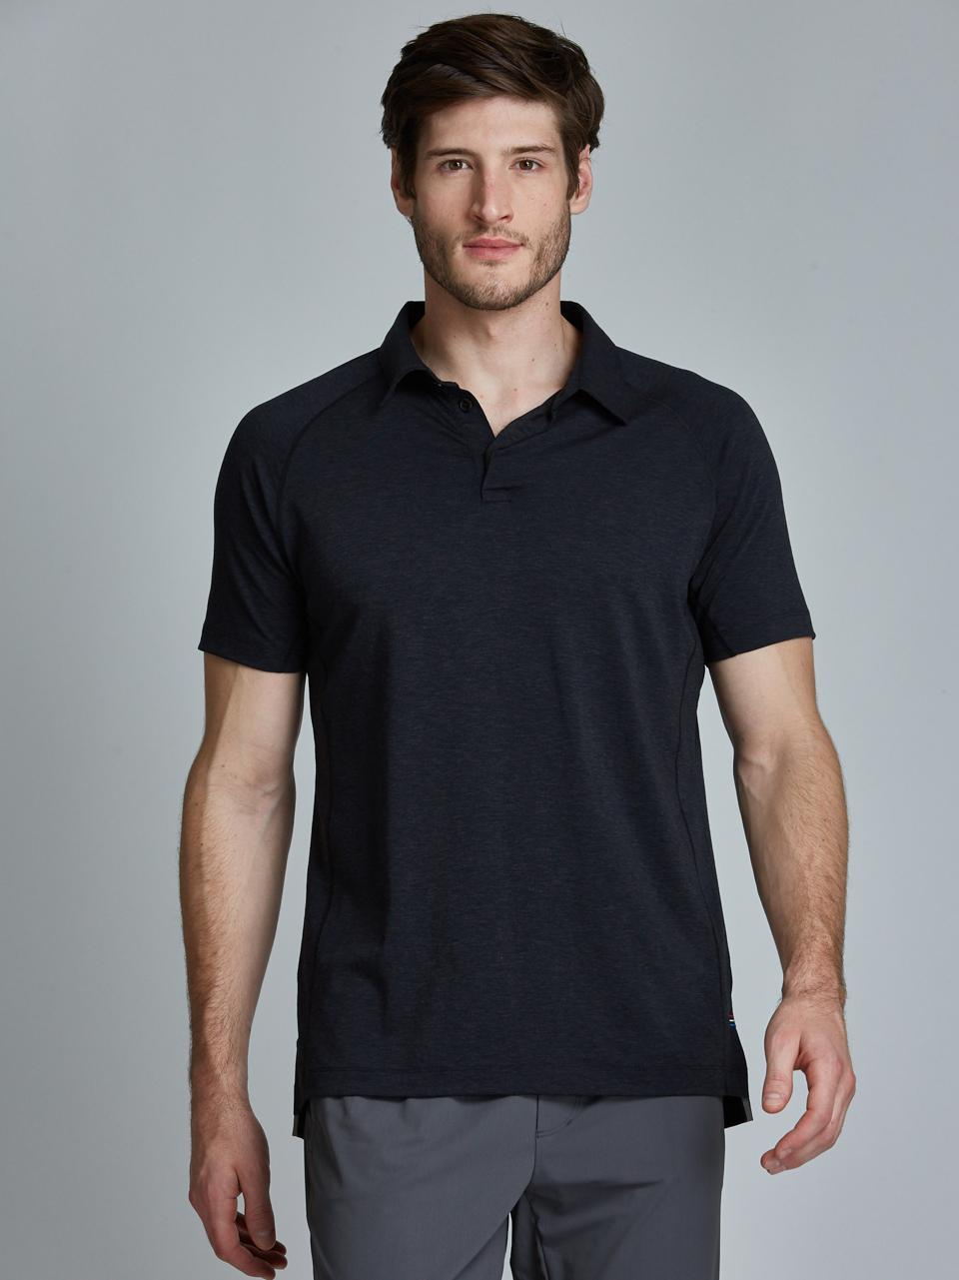 Level Tech Polo in Black